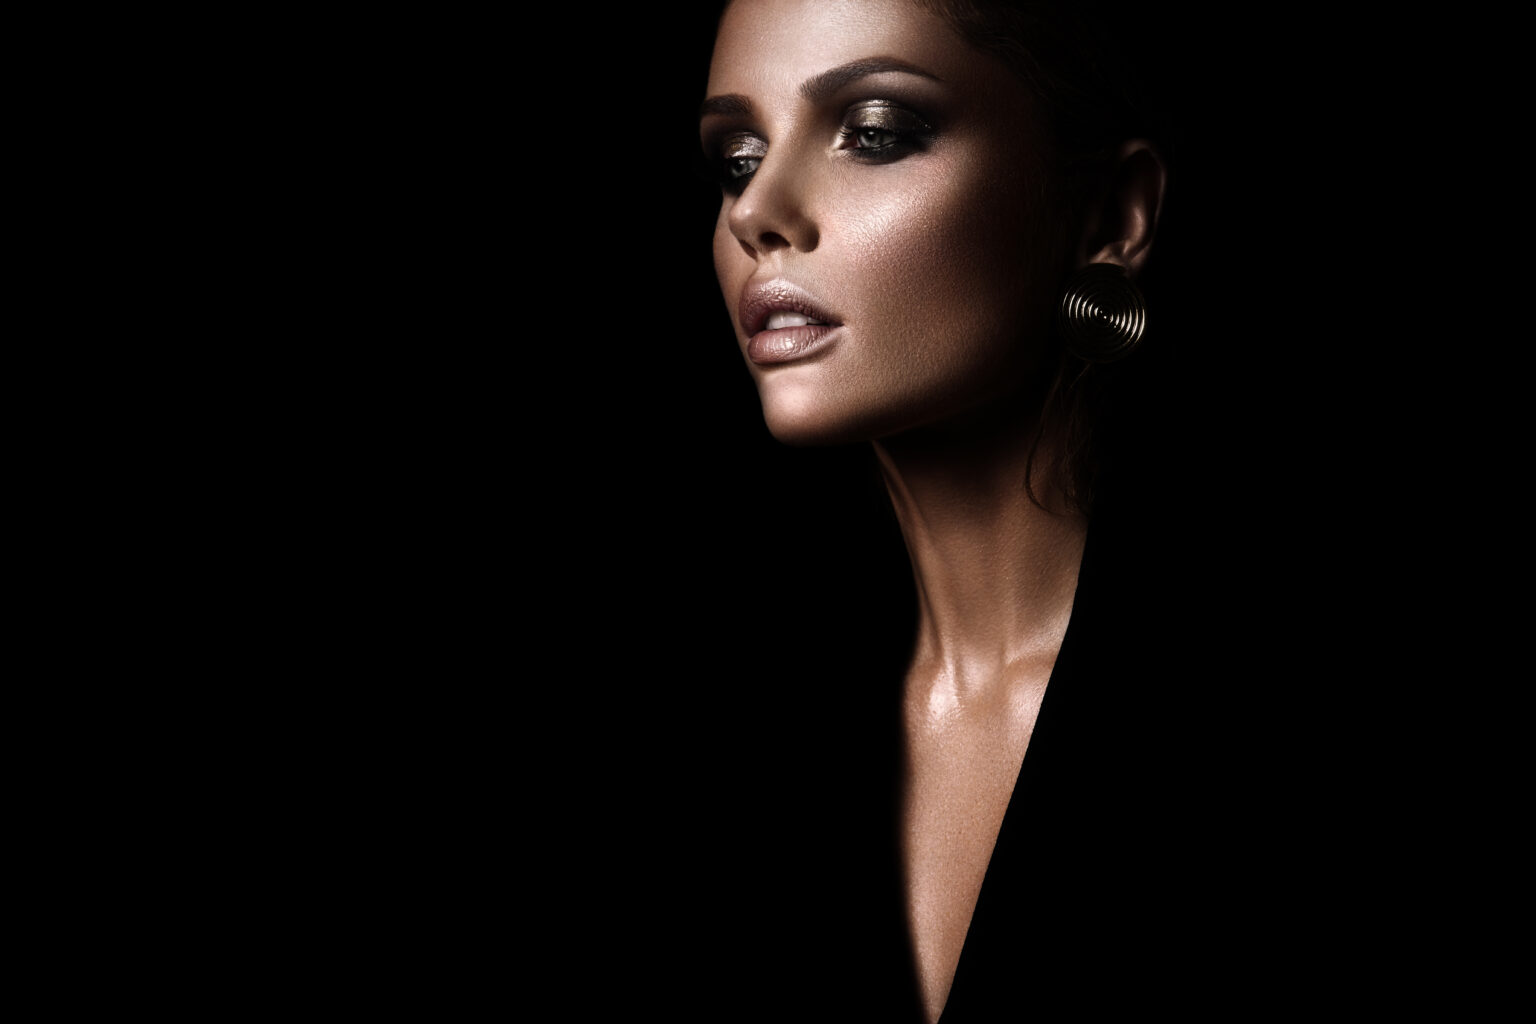 Baettig Abend Makeup - Glow - Smokey Eyes